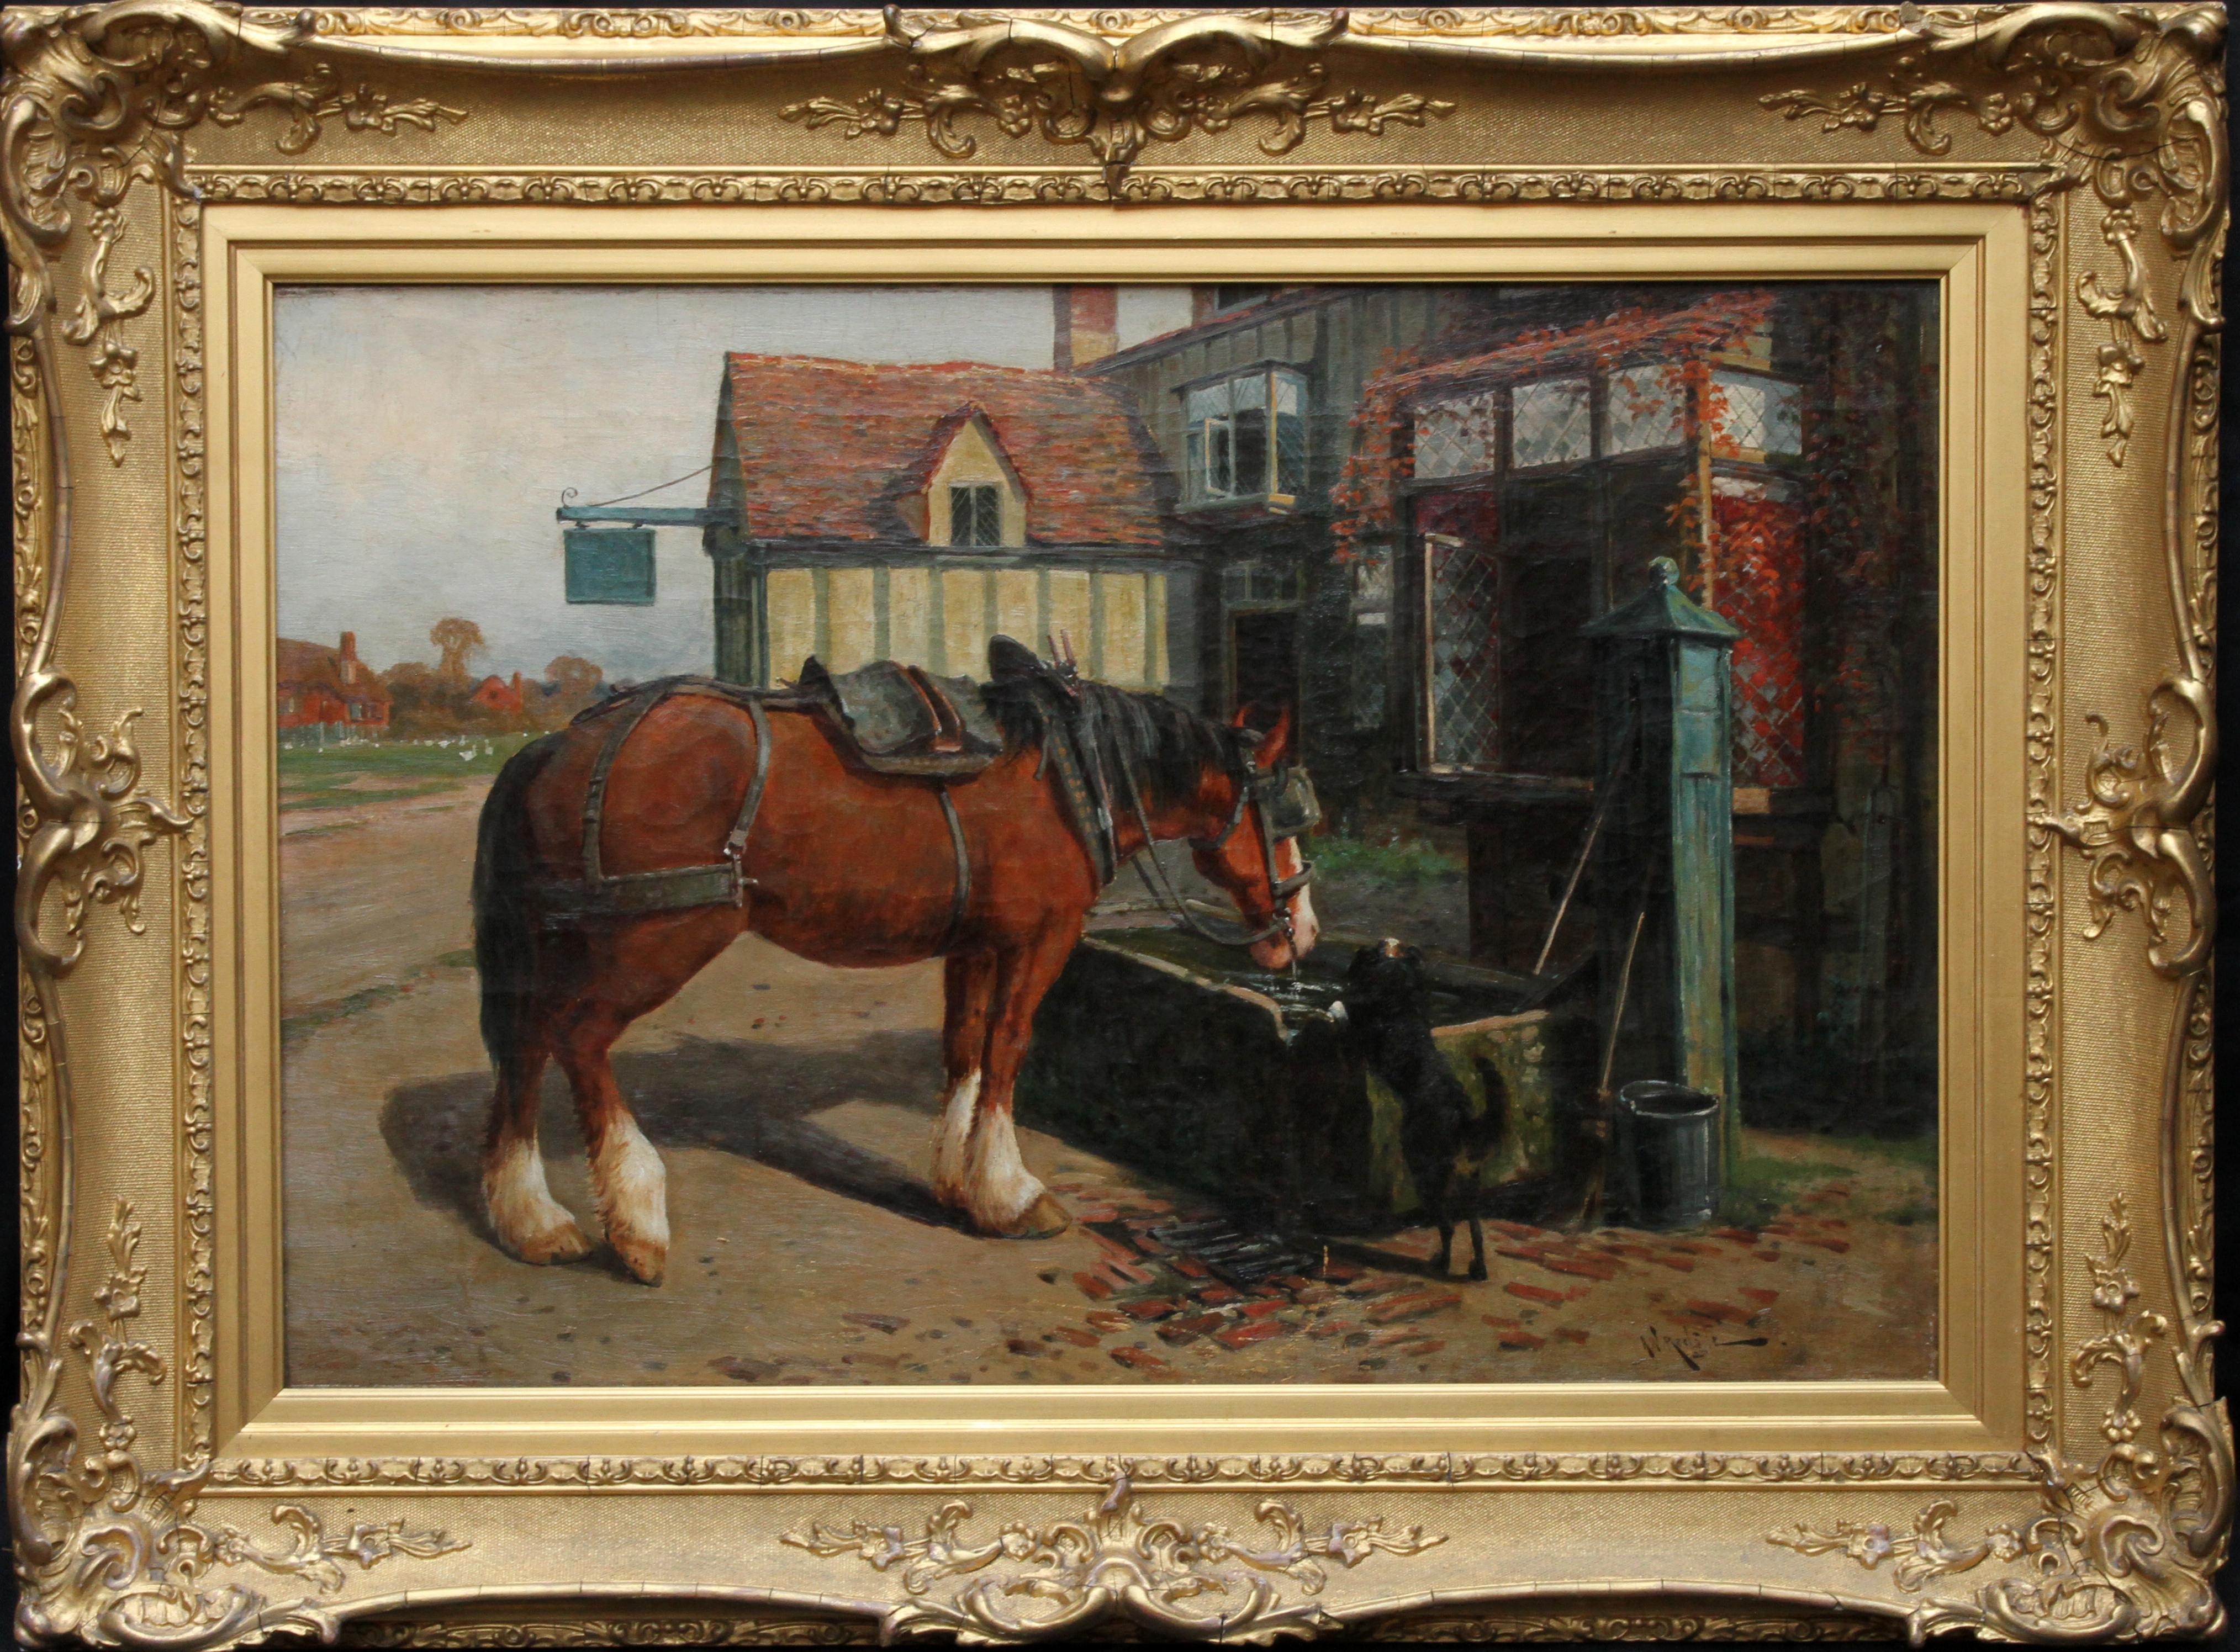 Farm Horse at Trough before a Tavern - British Victorian animal art oil painting